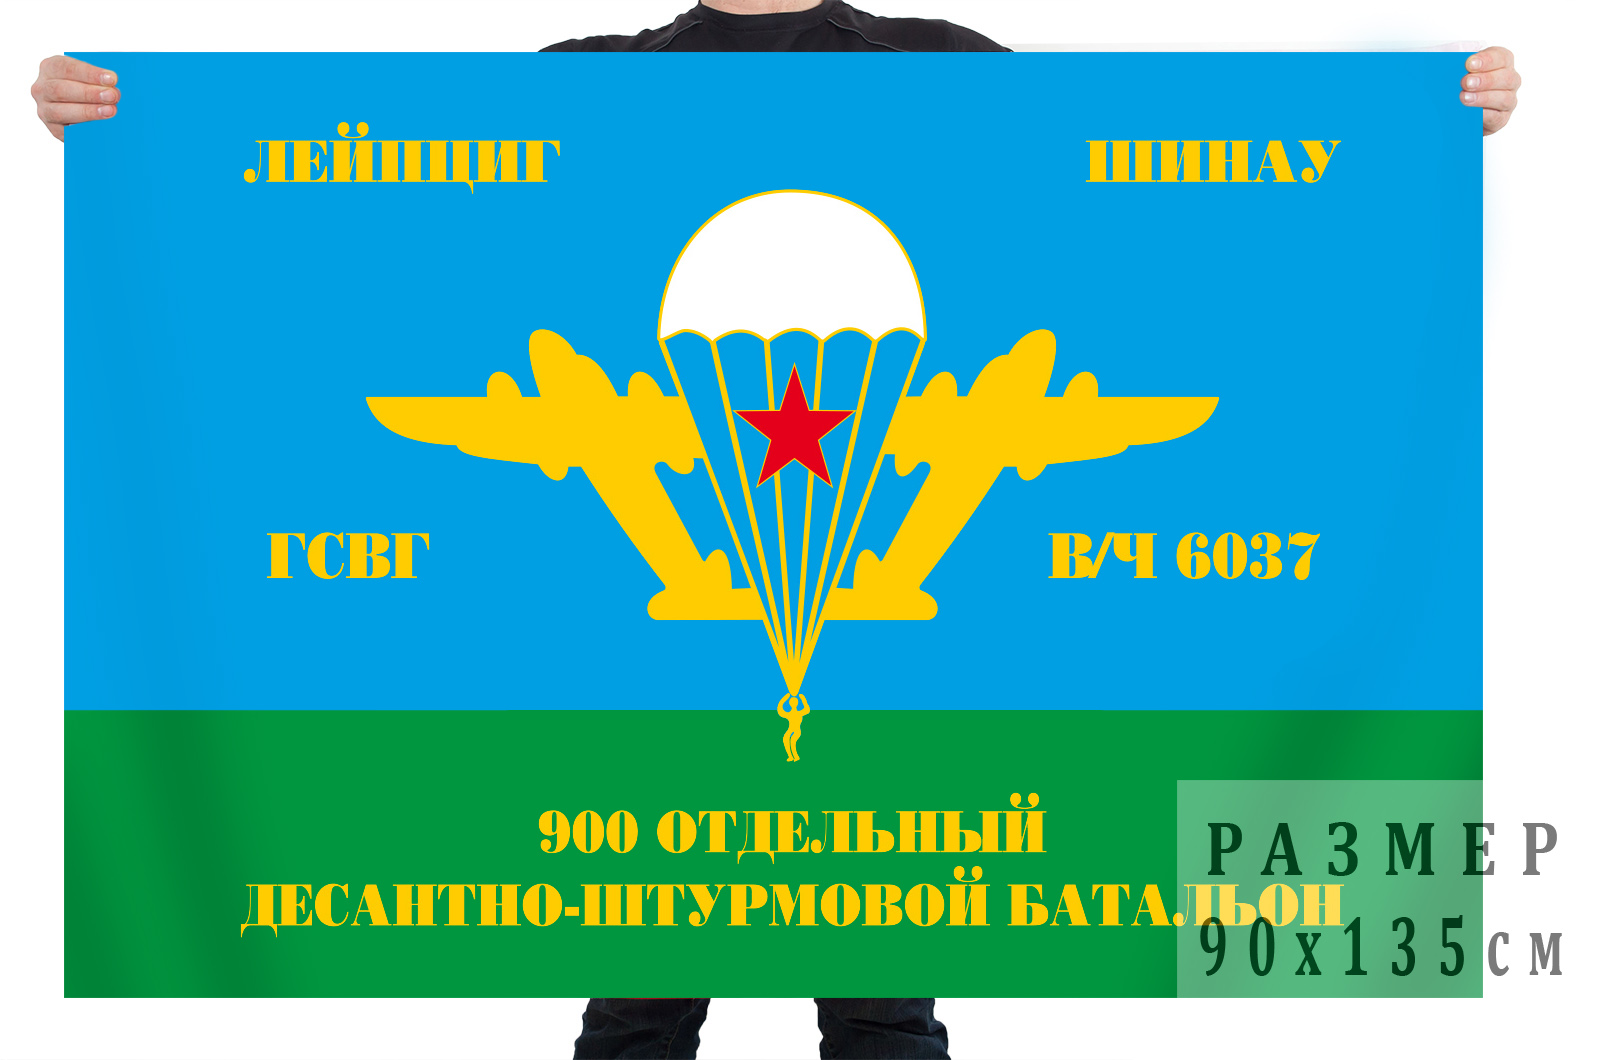 Флаг десанта 900 ДШБ Шинау в/ч 6037